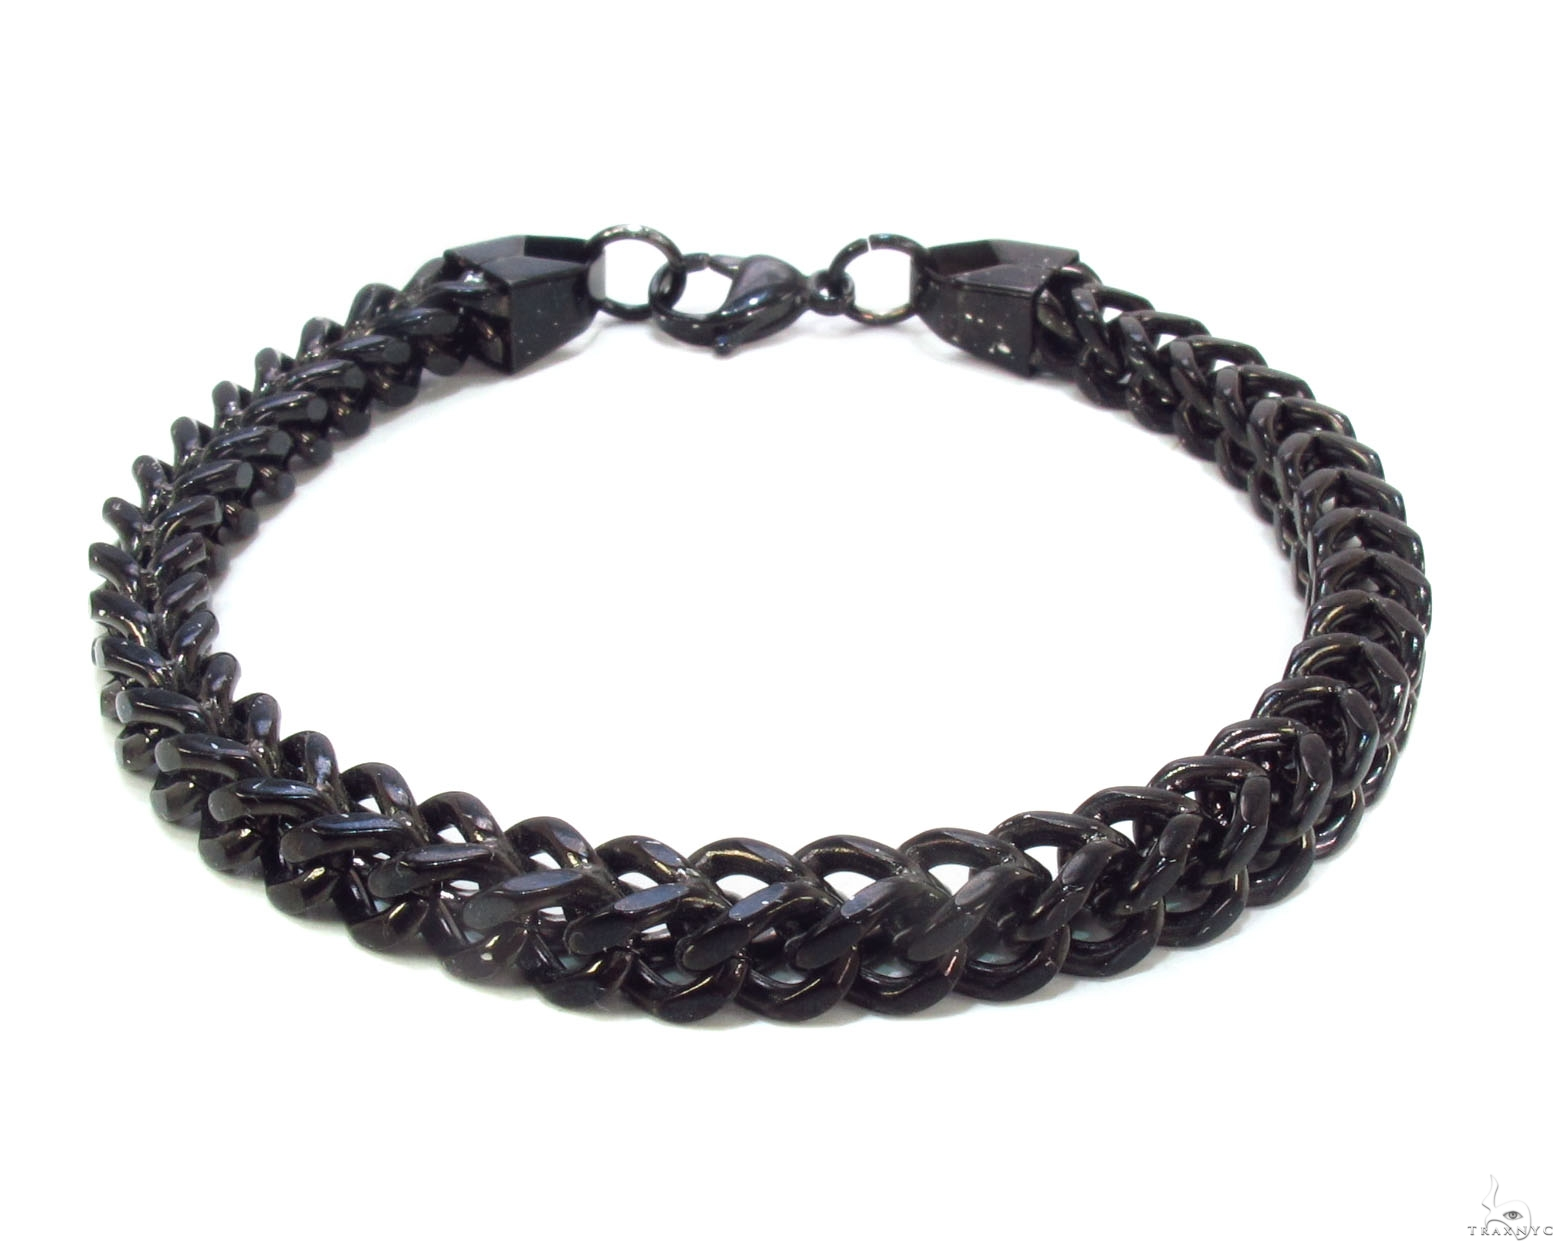 Stainless Steel Bracelet 36137 Stainless Steel